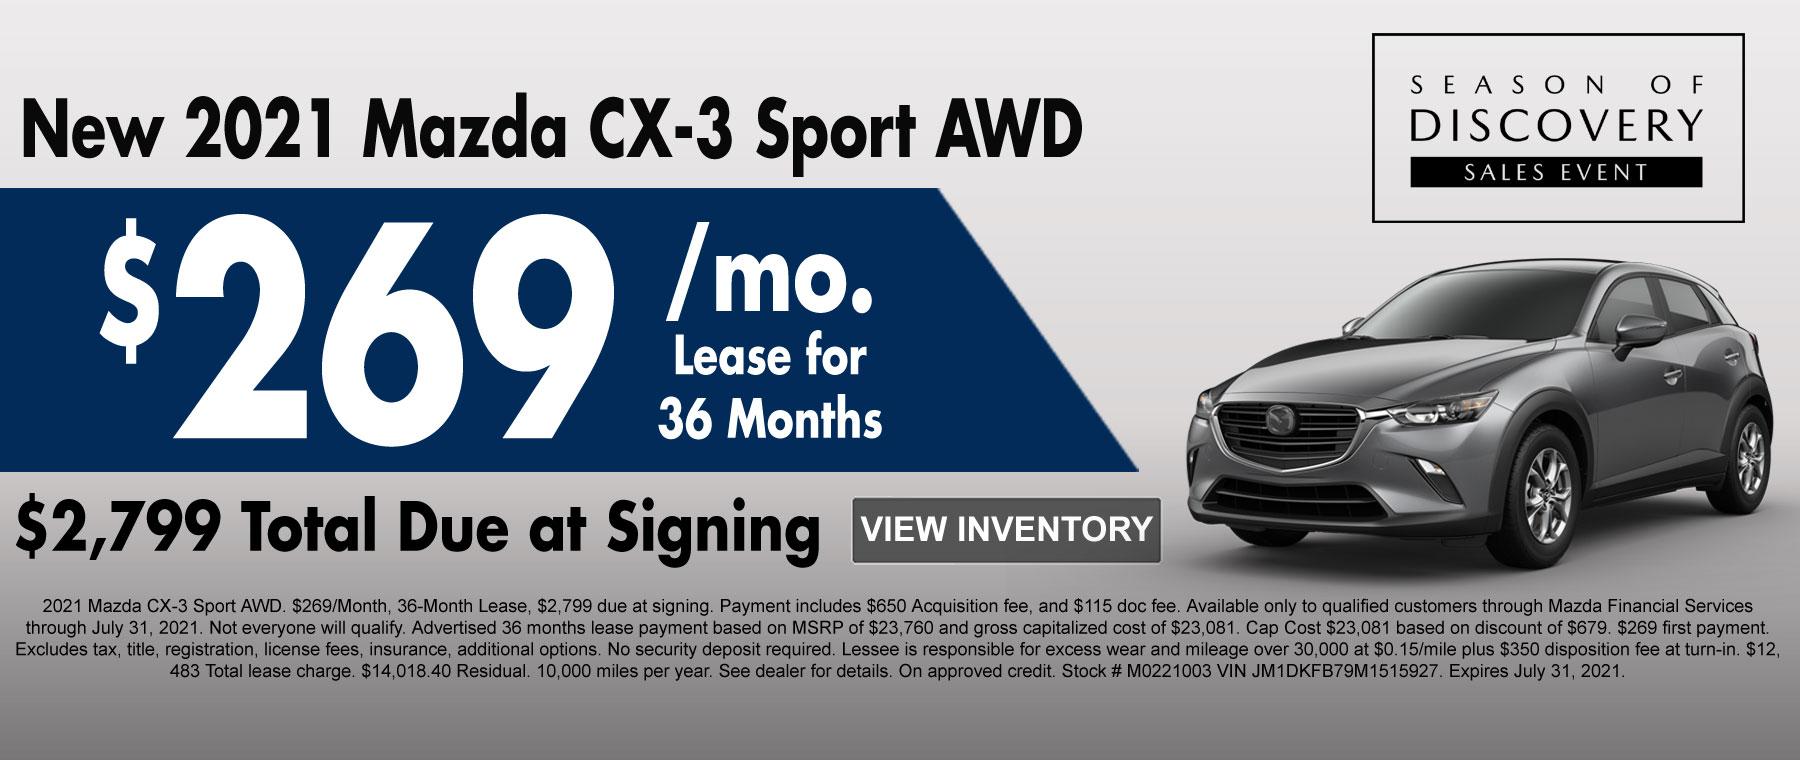 New 2020 Mazda CX-3 AWD Special